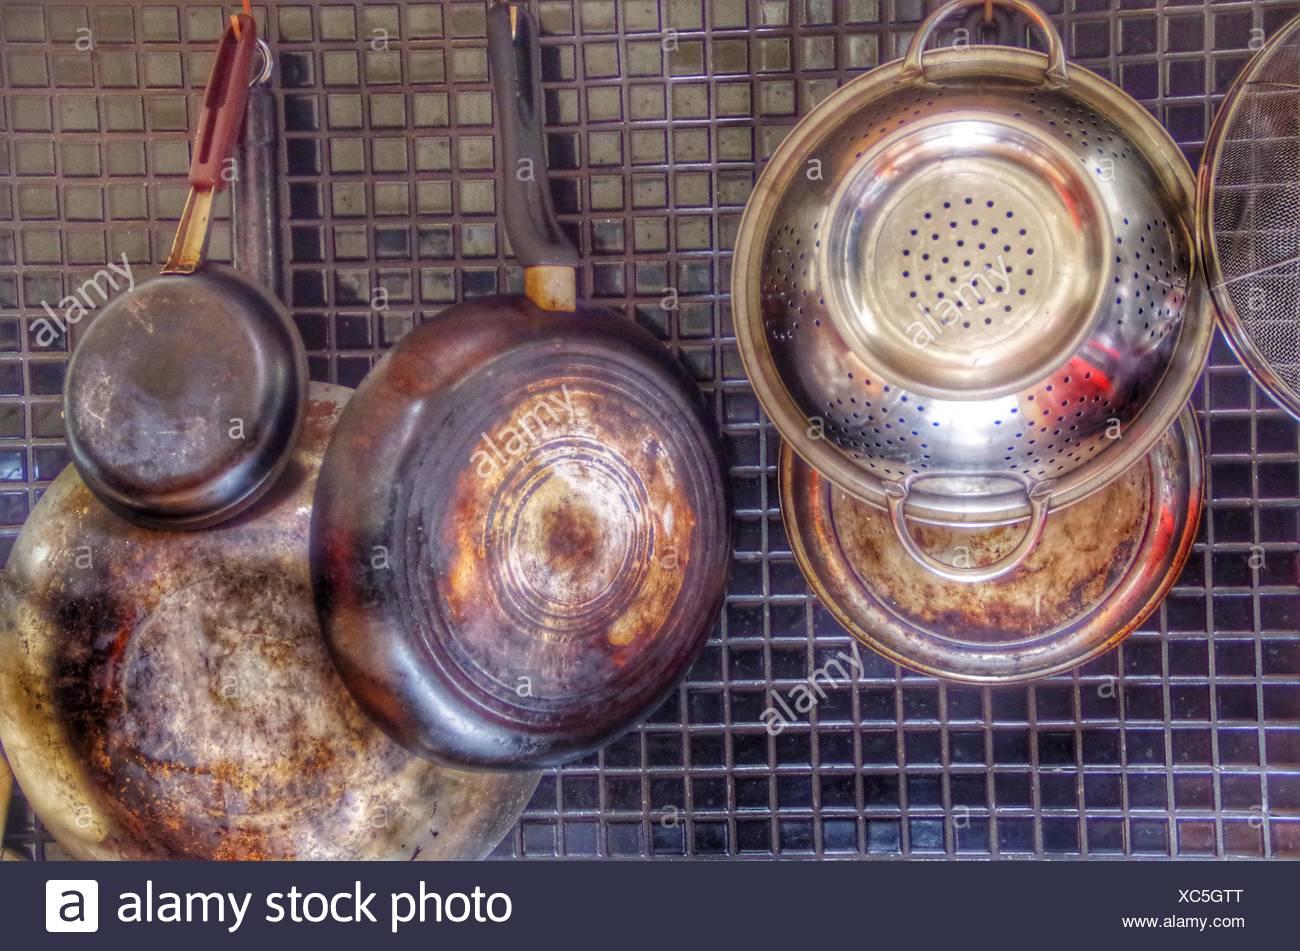 Saucepans And Kitchen Utensils Hanging On Backsplash At Home - Stock Image